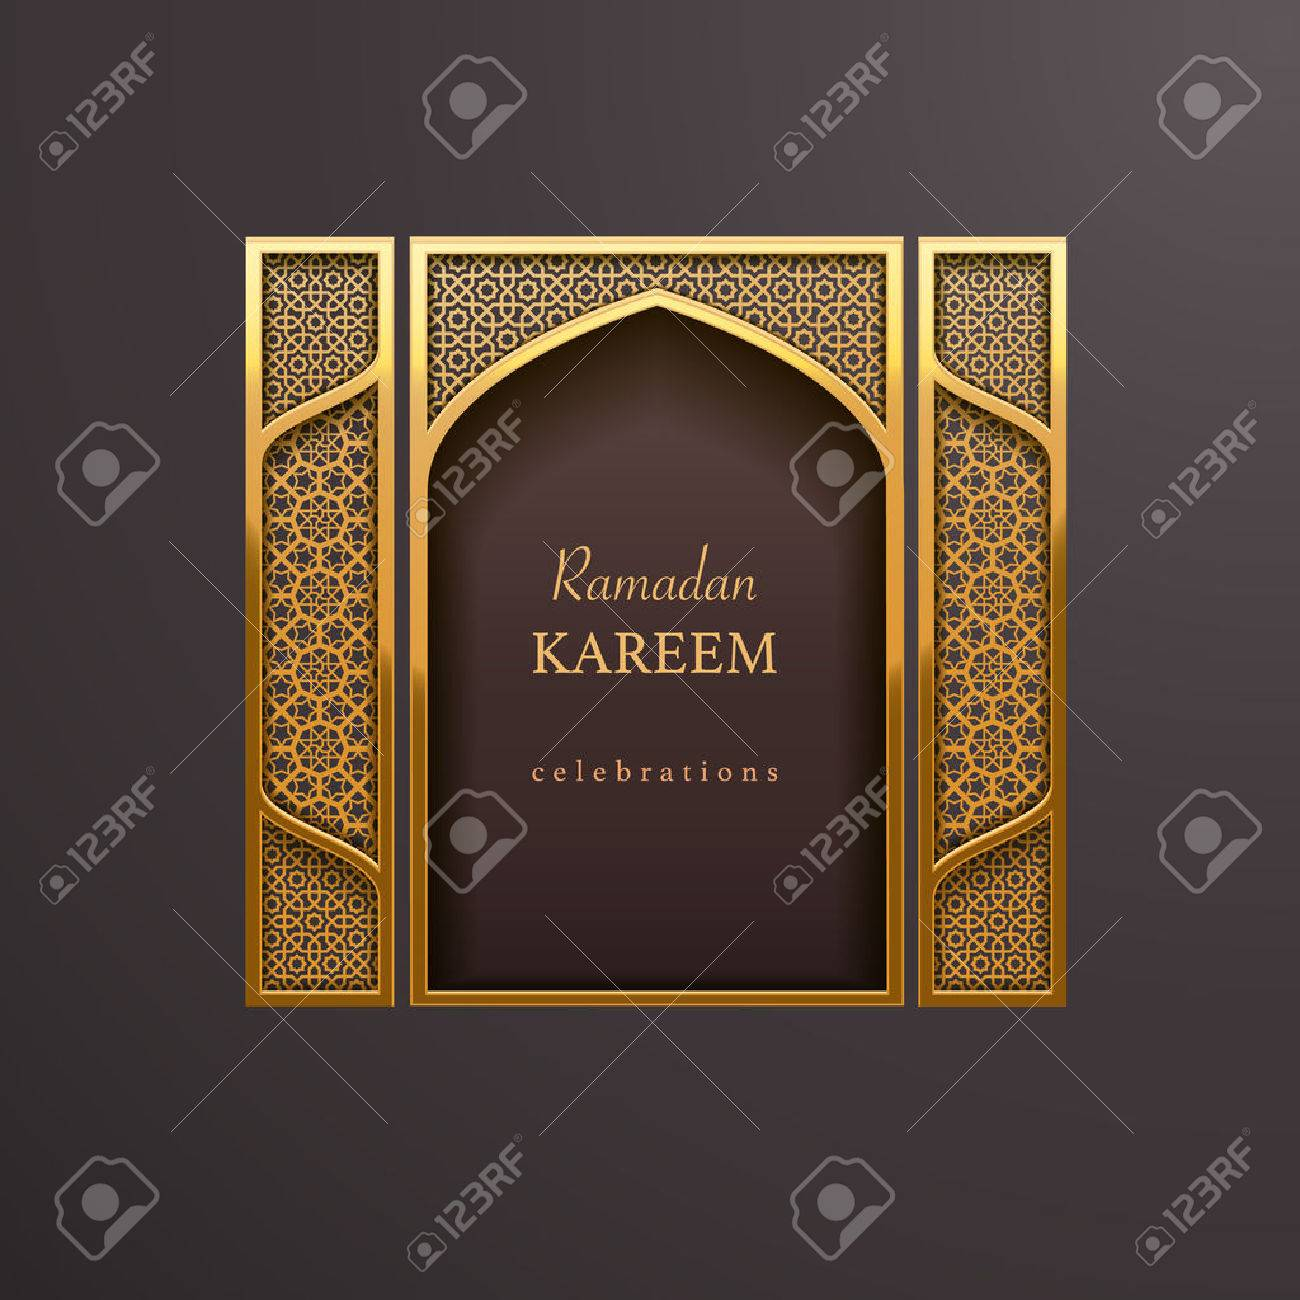 Ramadan design background - 55678387